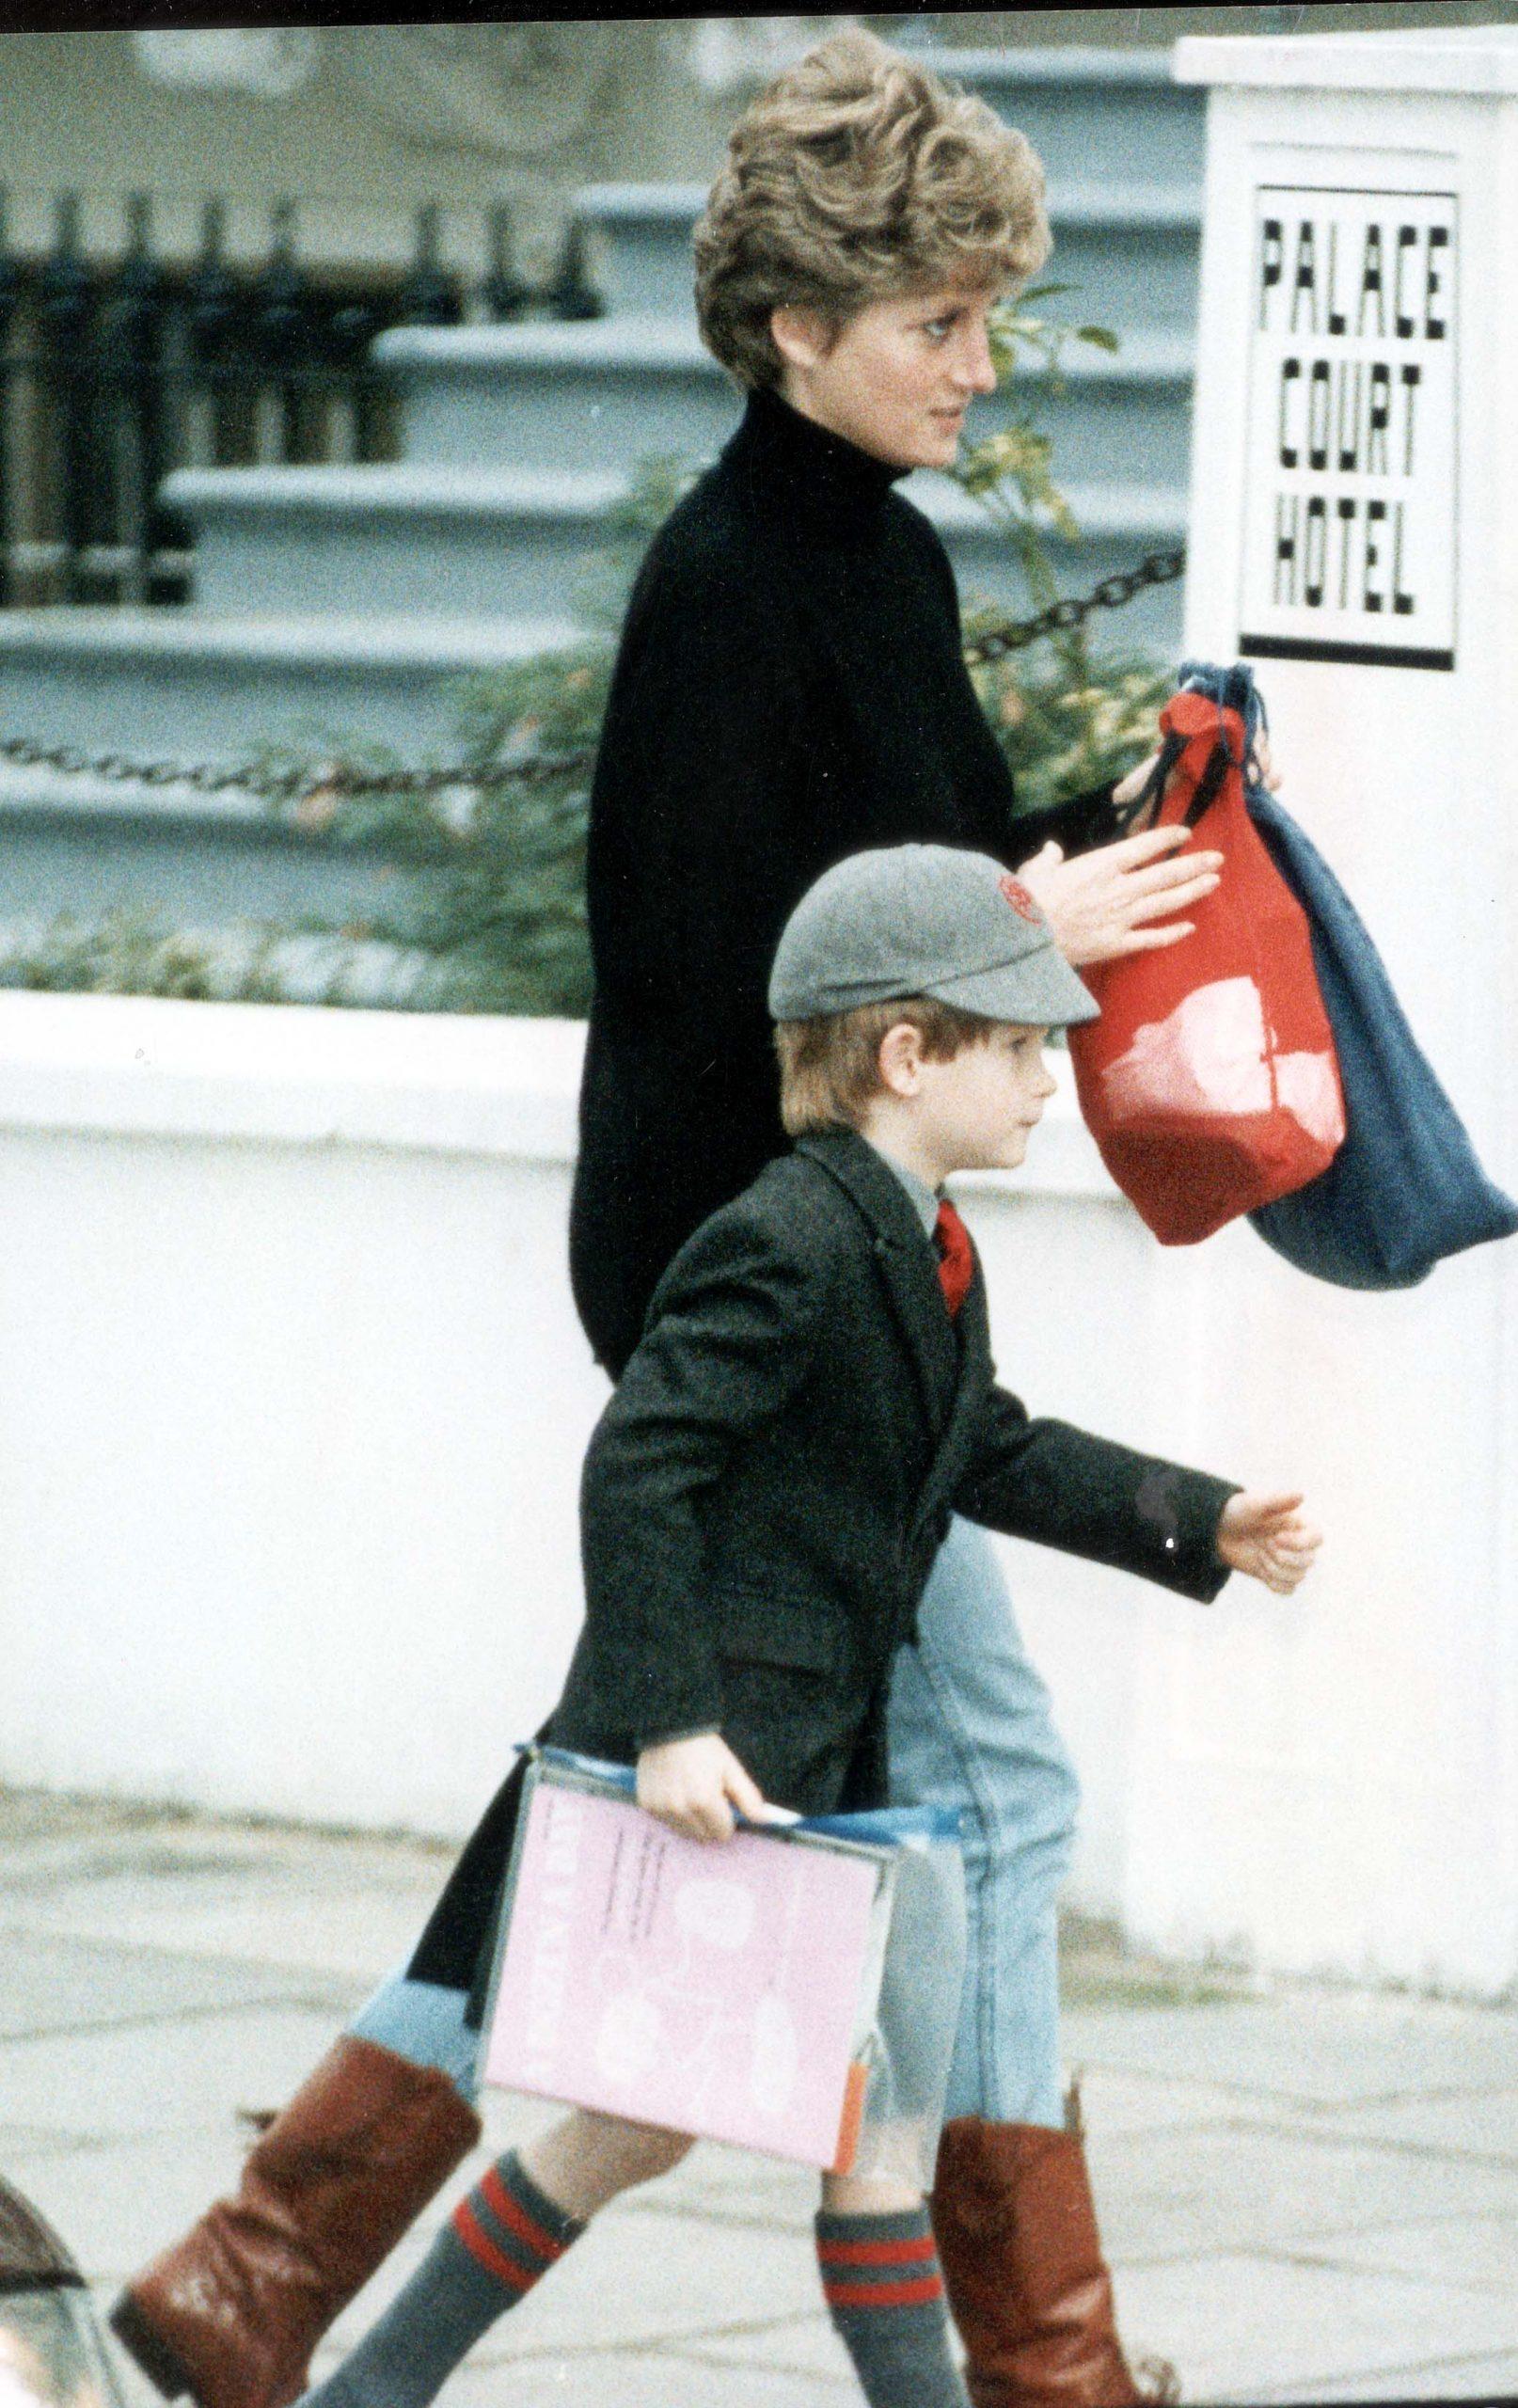 Prince Harry Education 9th Jan 1992